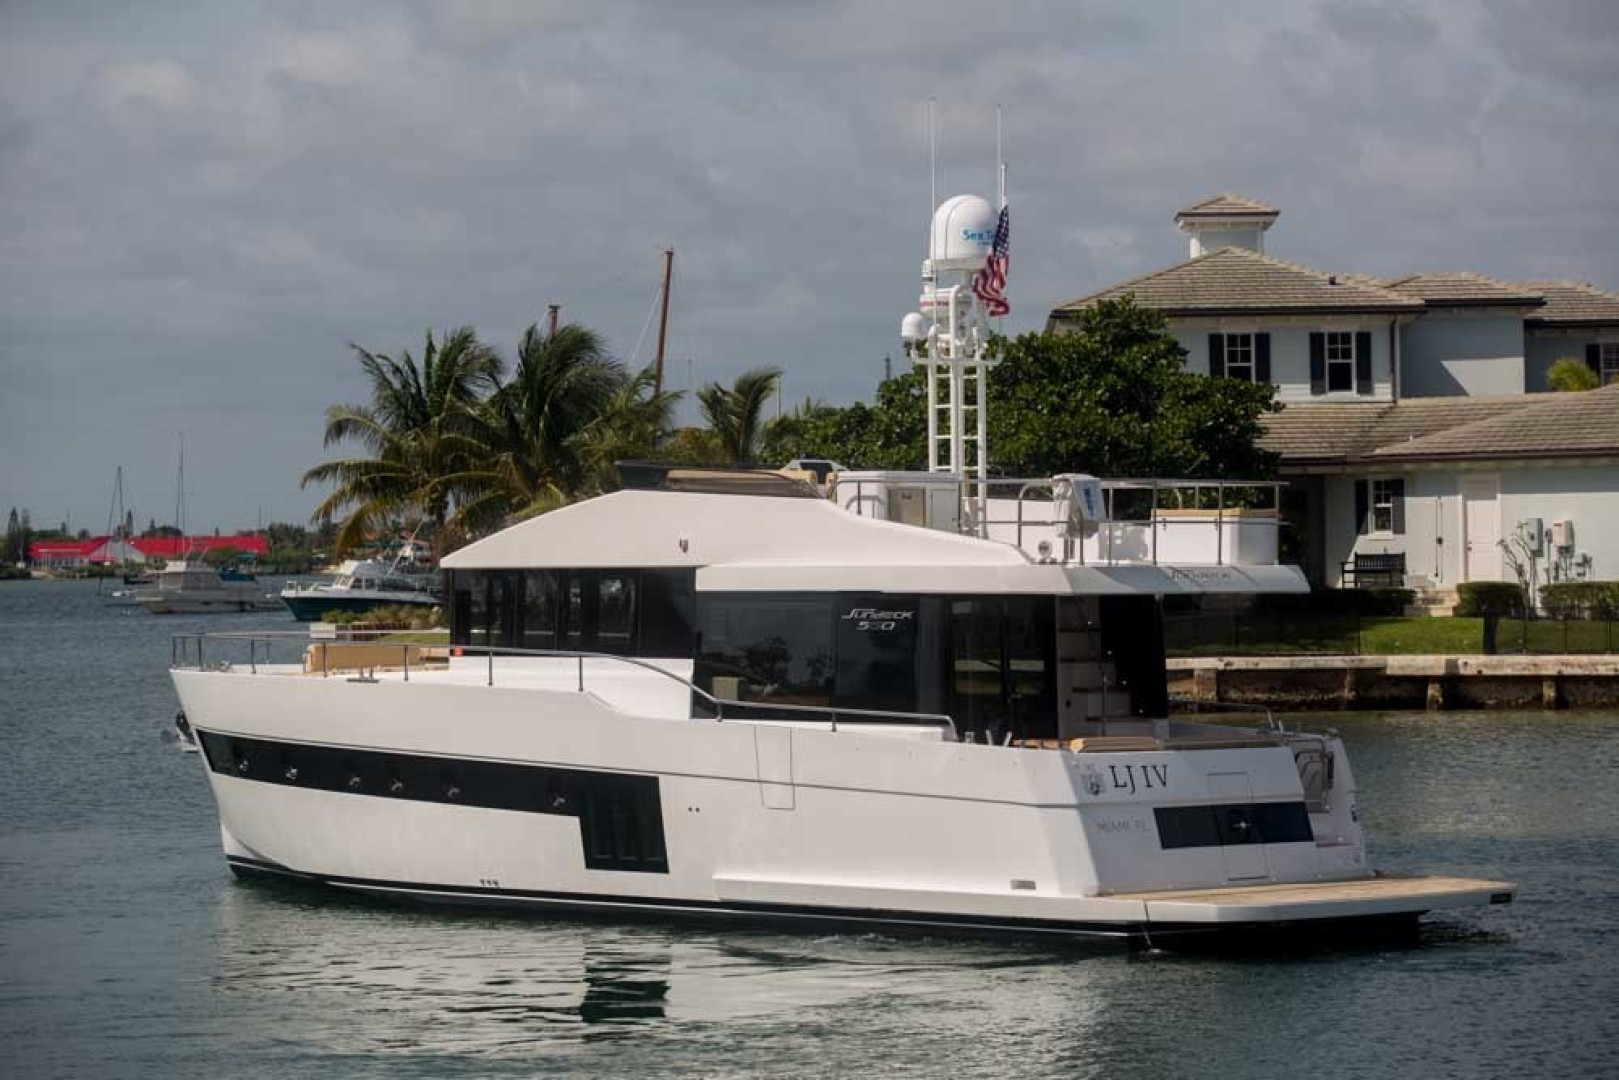 Sundeck-58 Sport 2019-LJ IV Singer Island-Florida-United States-LJ IV-1373125 | Thumbnail